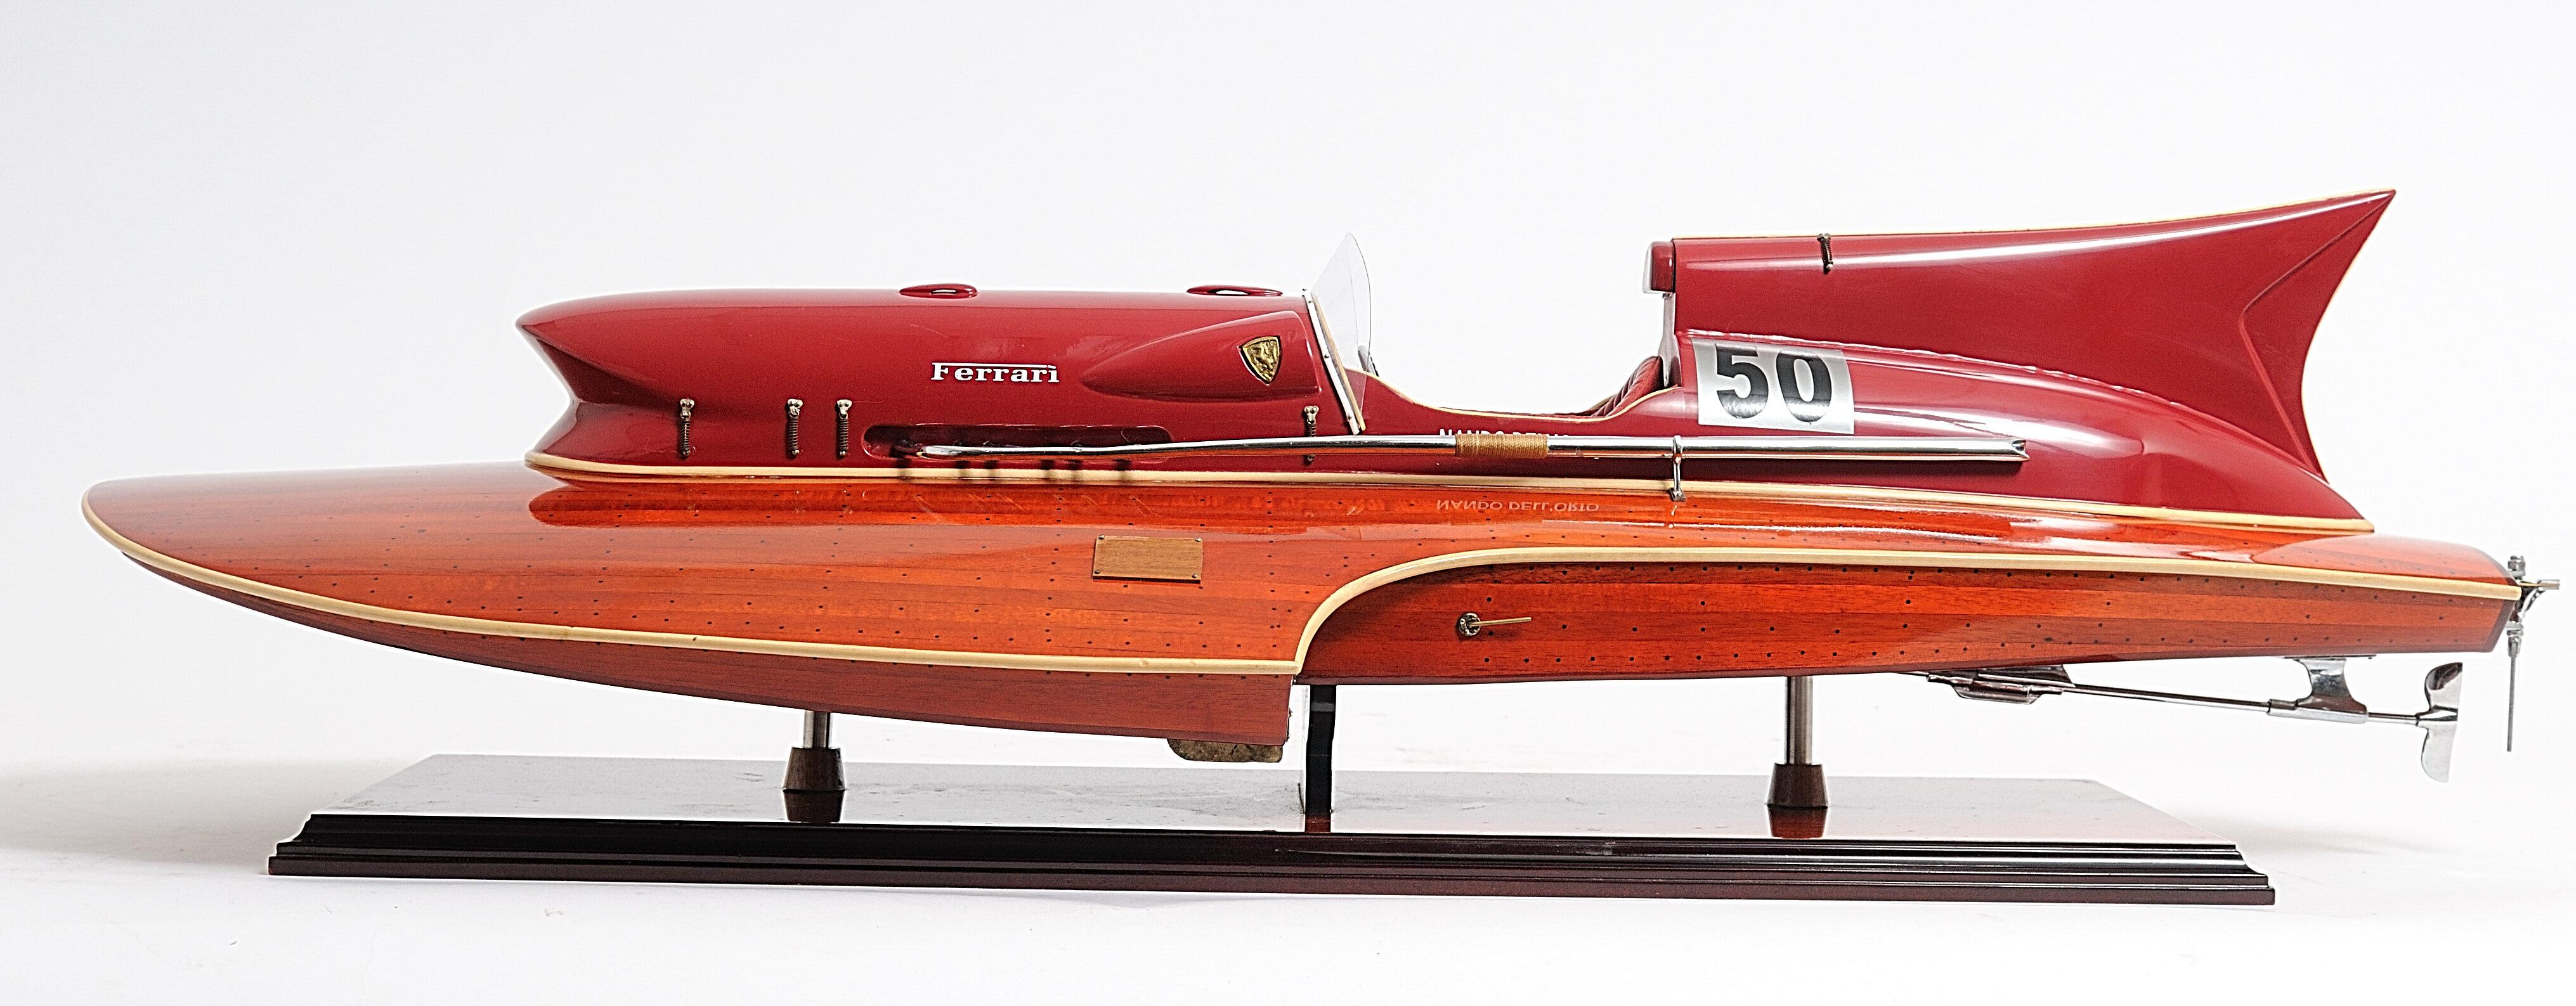 Ferrari Hydroplane High Quality Hand Craft Wooden Model Ship Speed Boat 32 Colorcard De